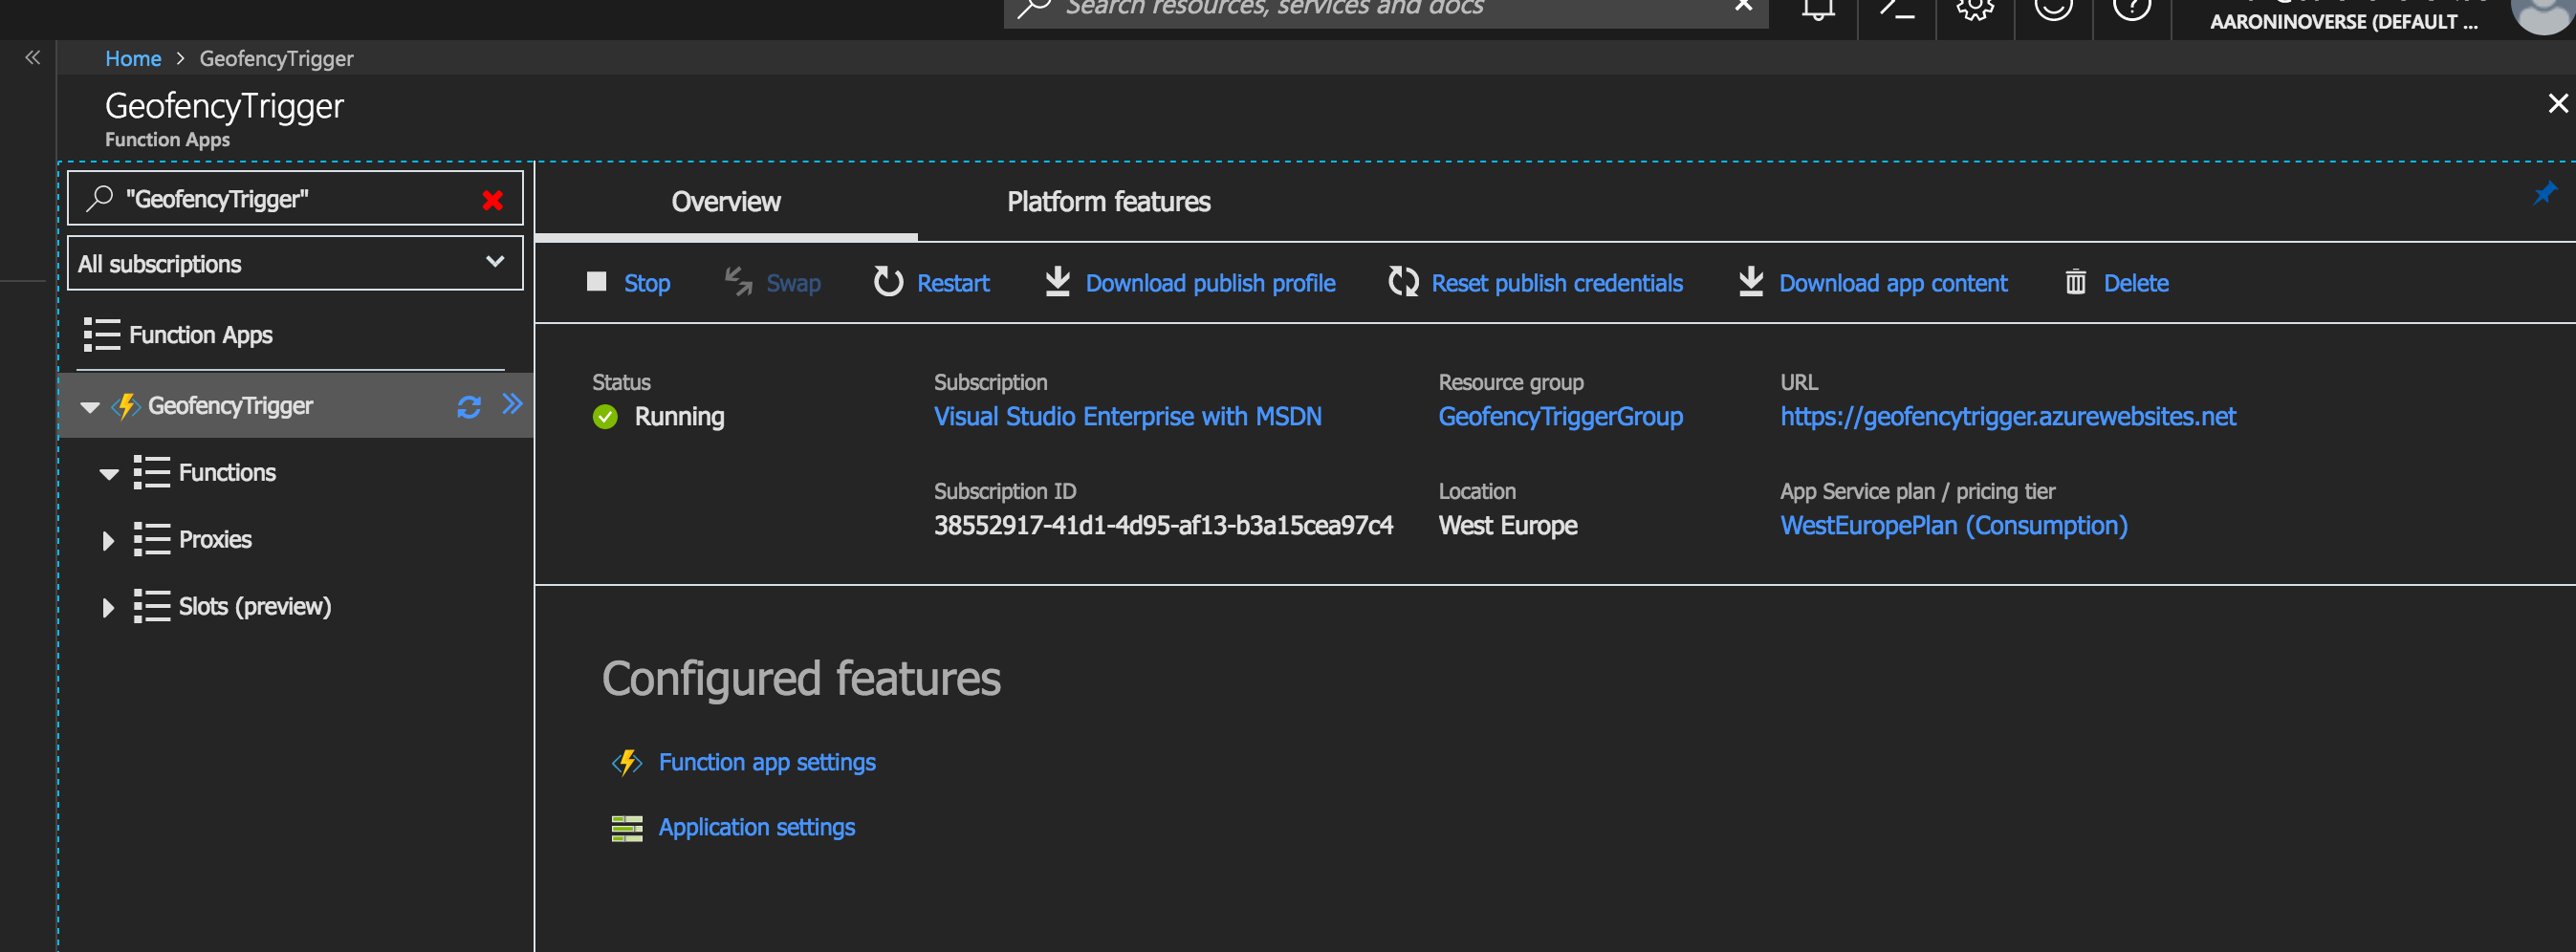 Azure Function App Overview